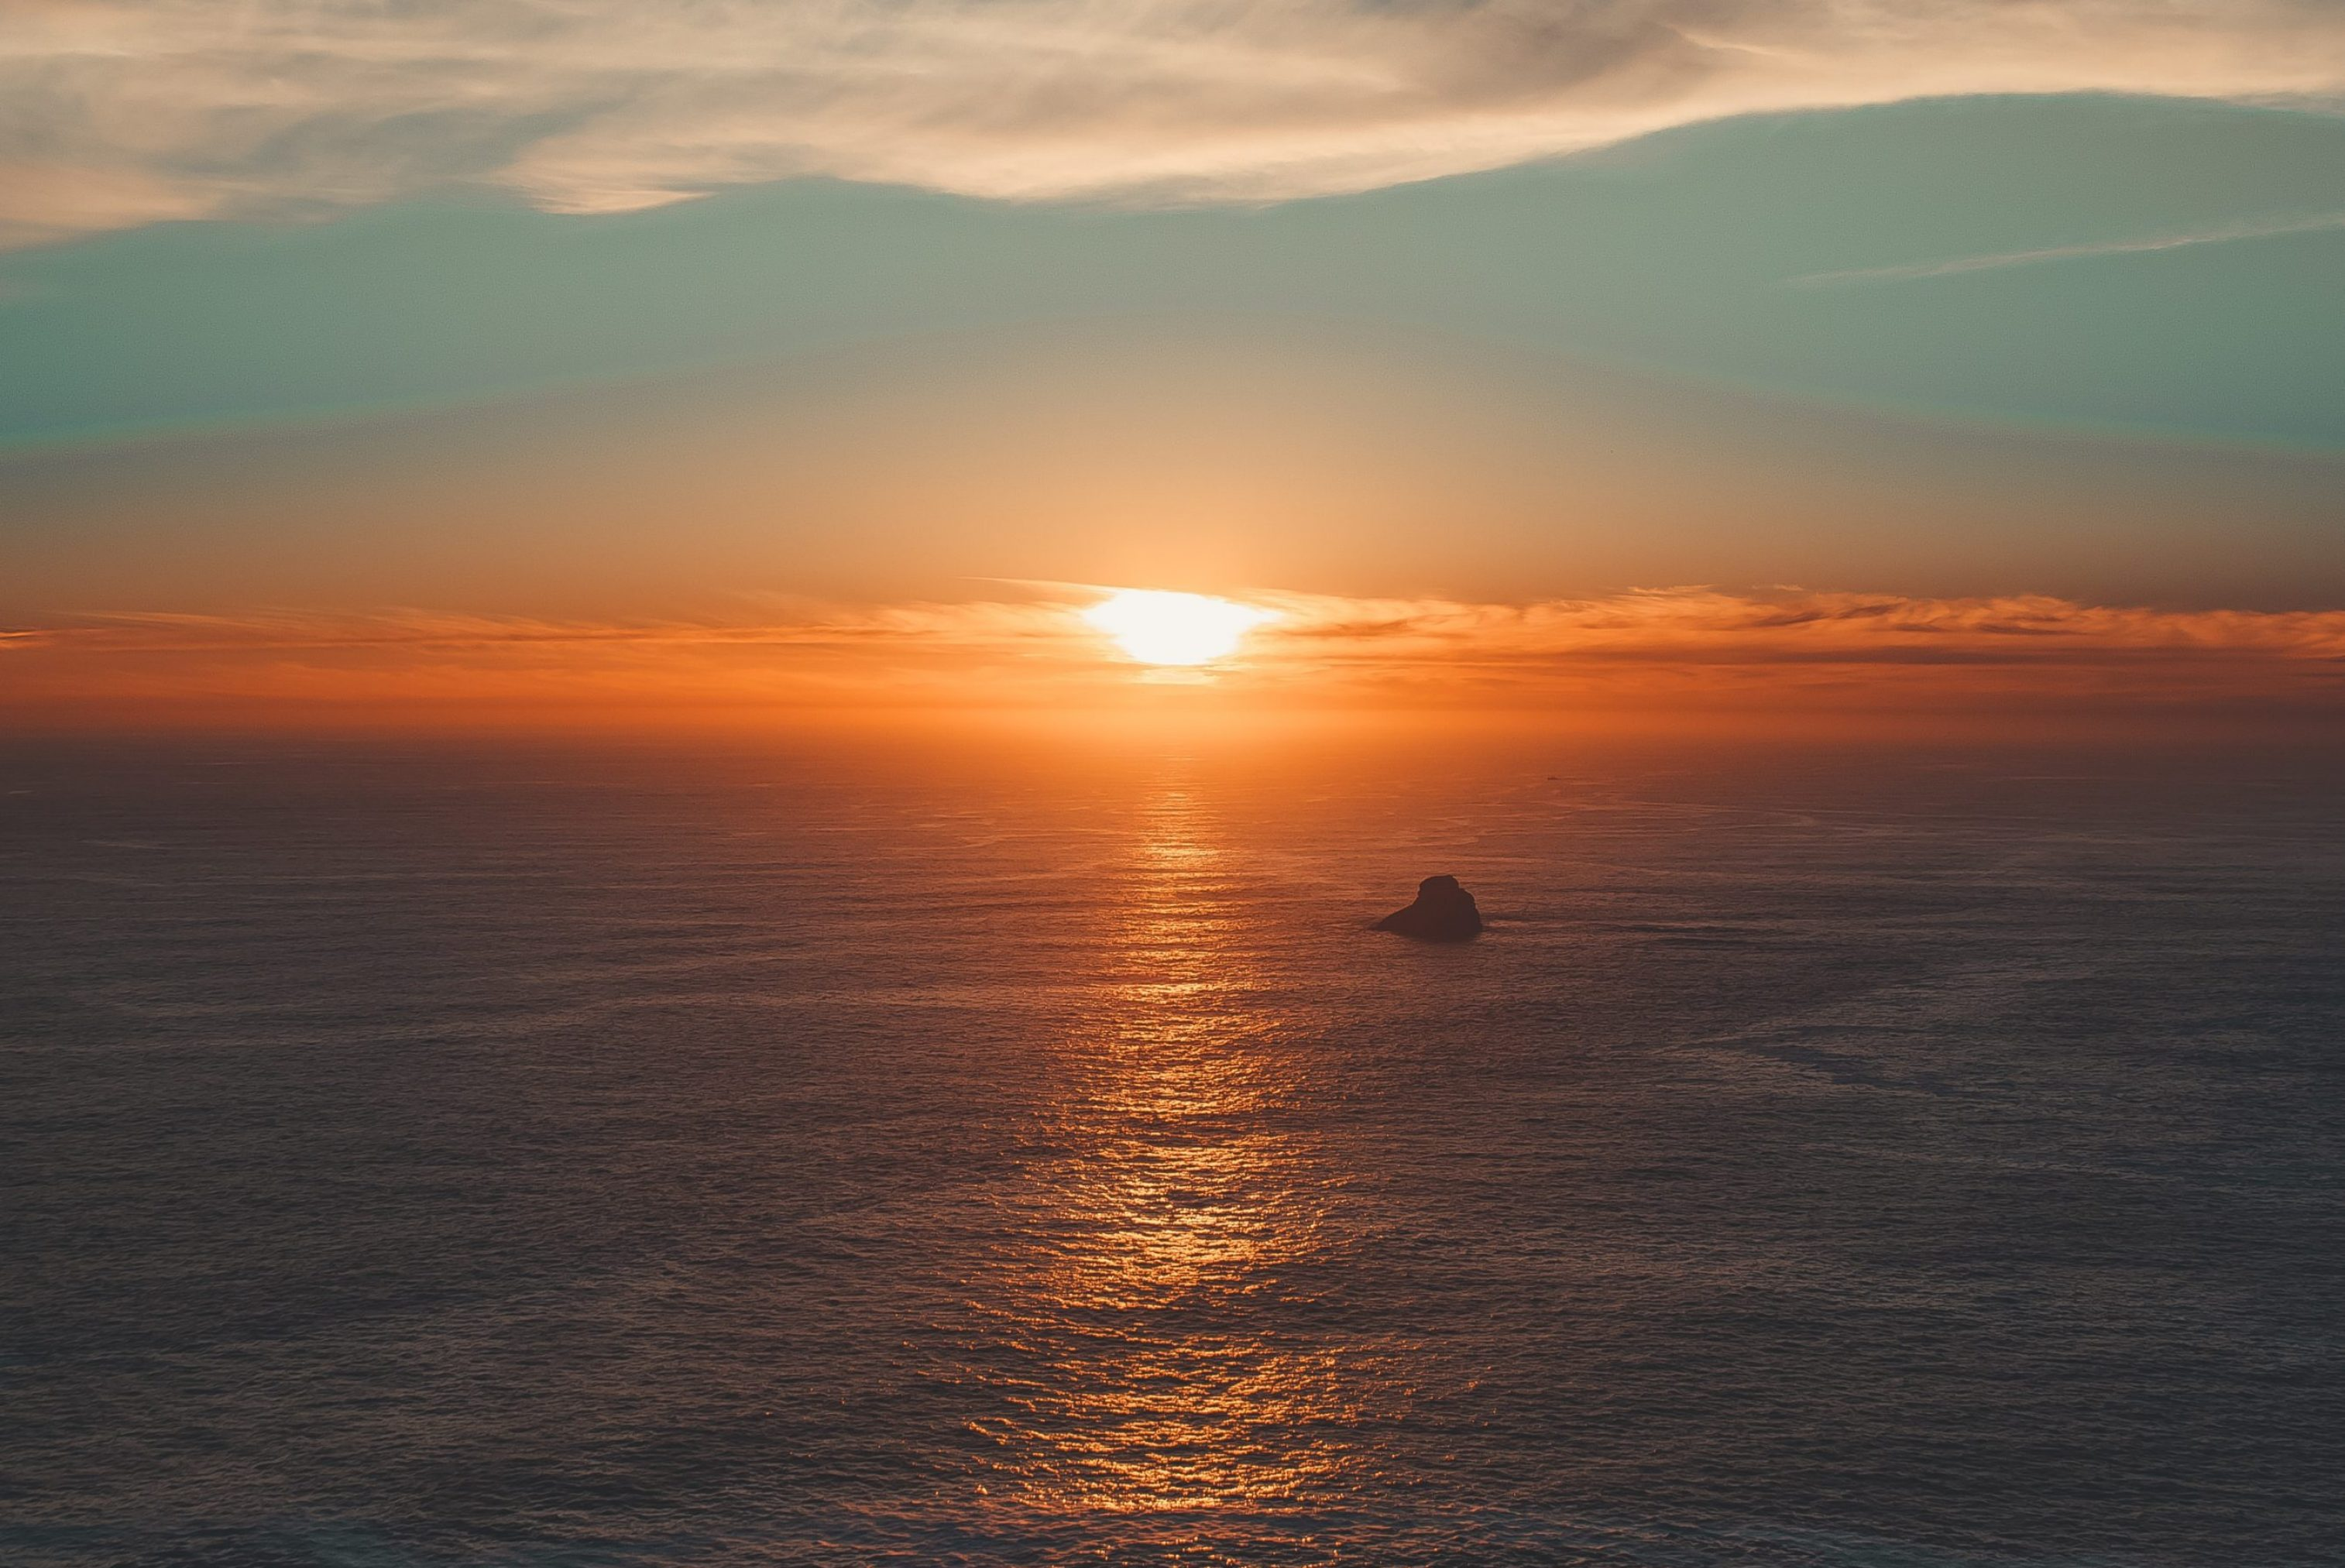 Sunset Photo by Ave Calvar on Unsplash